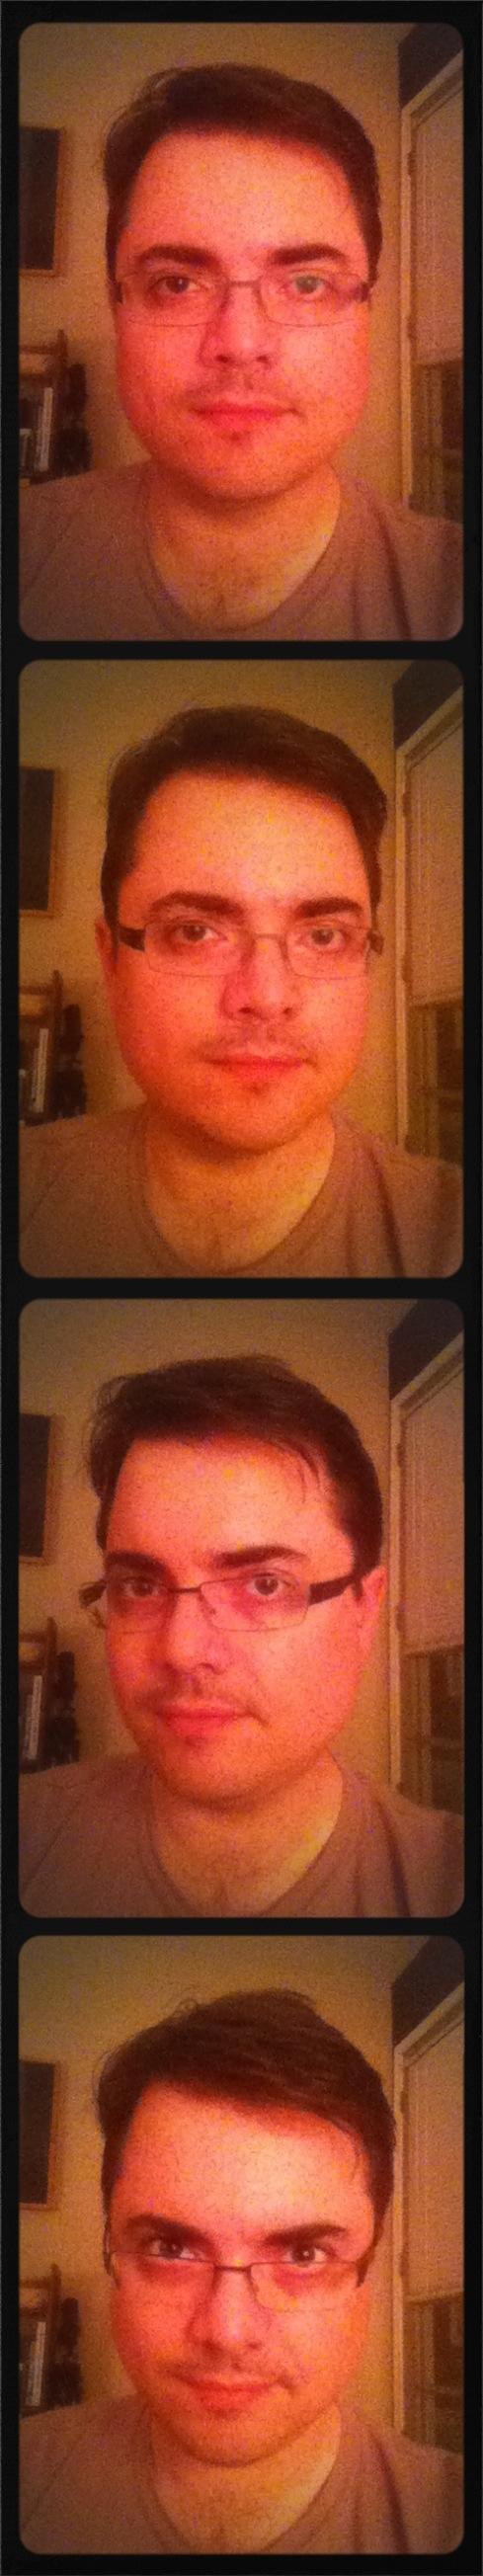 Movember 2nd